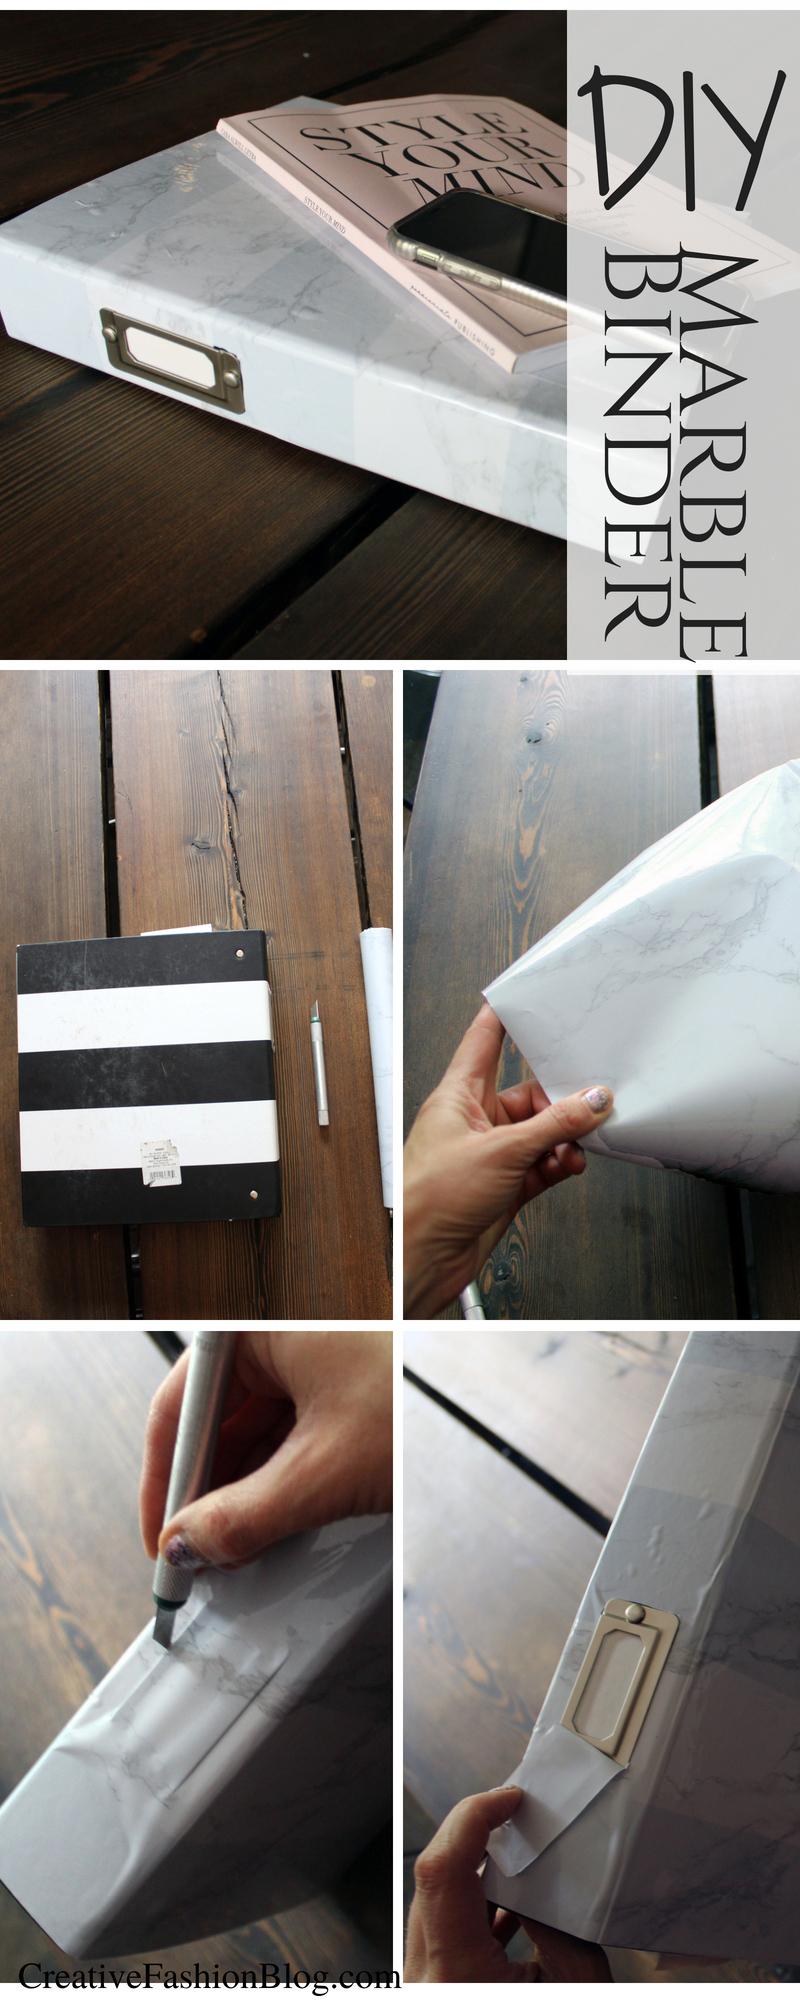 Marble binder DIY craft project .